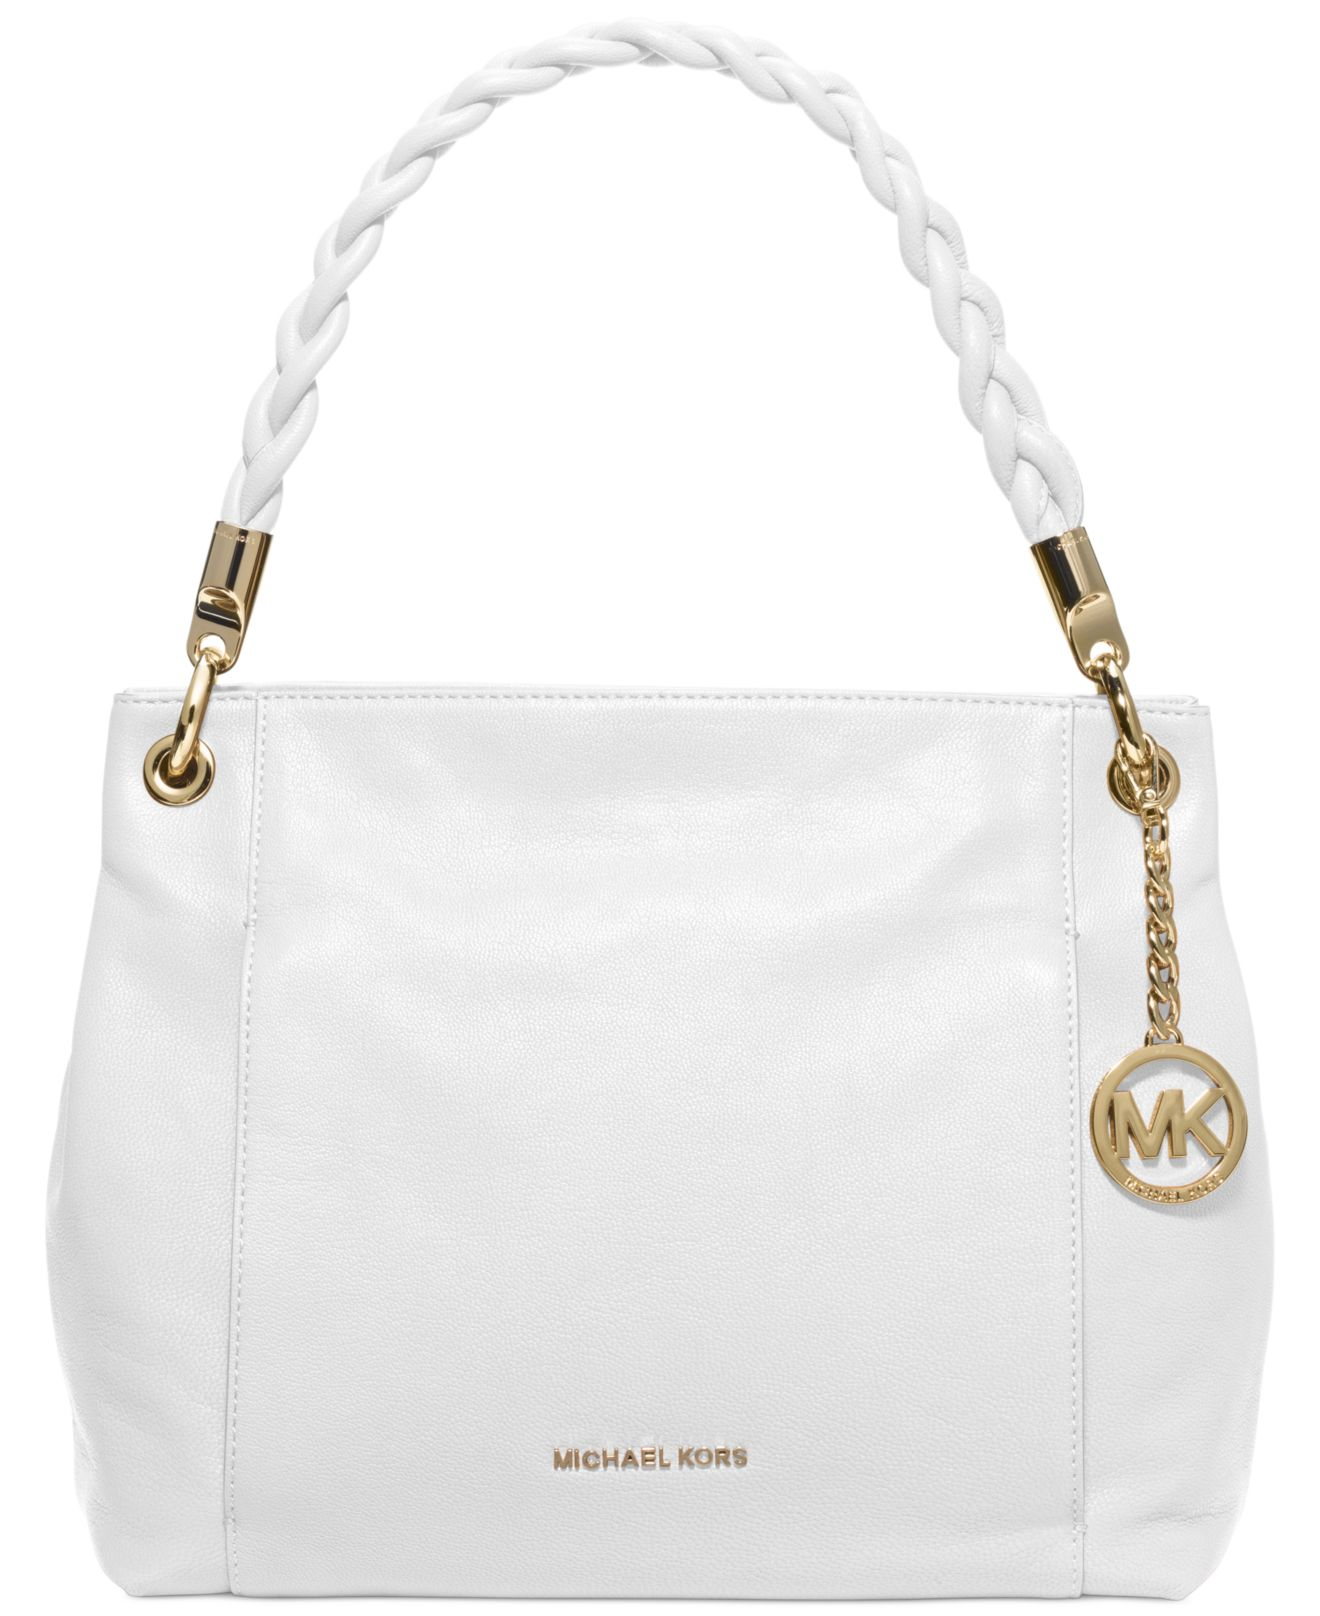 60340ed3aa5c07 ... ebay lyst michael kors michael naomi large shoulder bag in white 76b6b  daf97